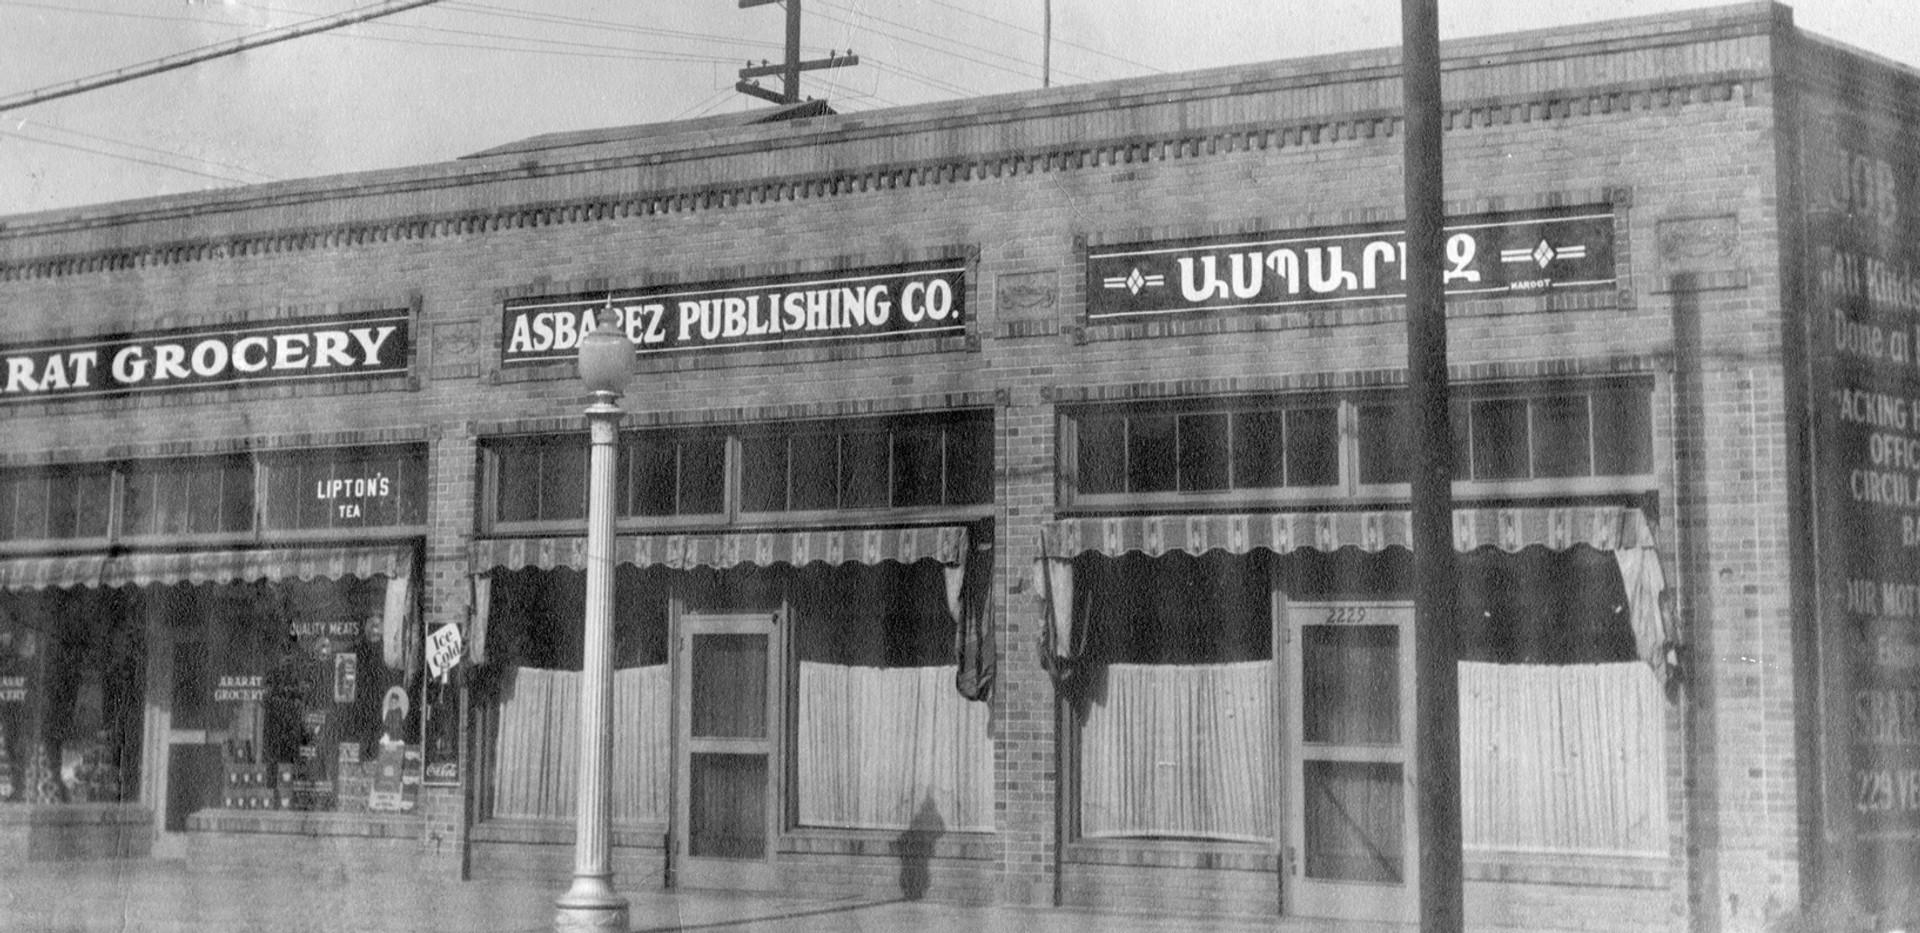 February14,1937 - Armenian's Ararat Grocery Store